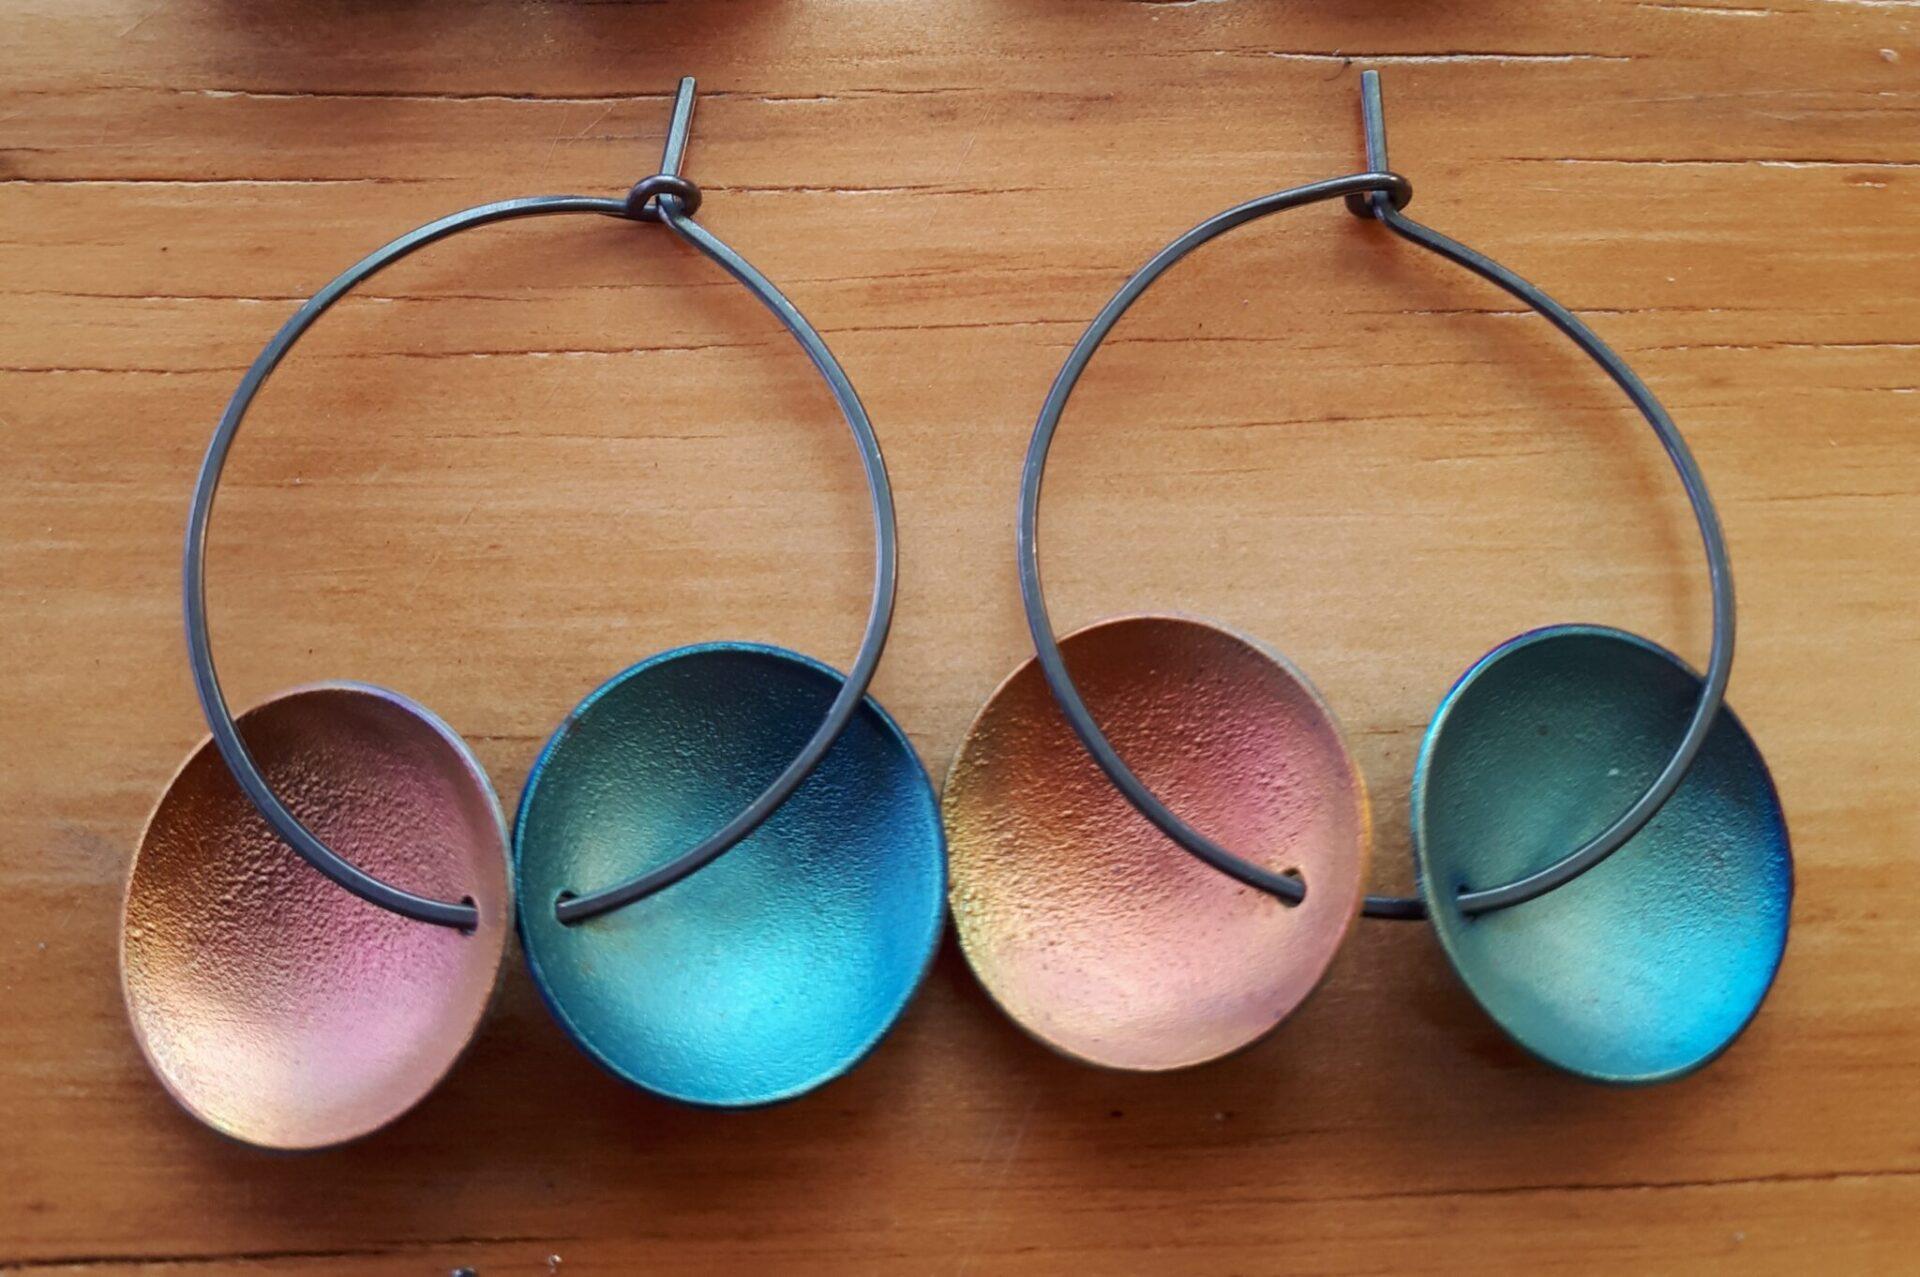 Double Dot Shibuichi Hoop Earrings 'Orange & Soft Blue' By Emma Hesz